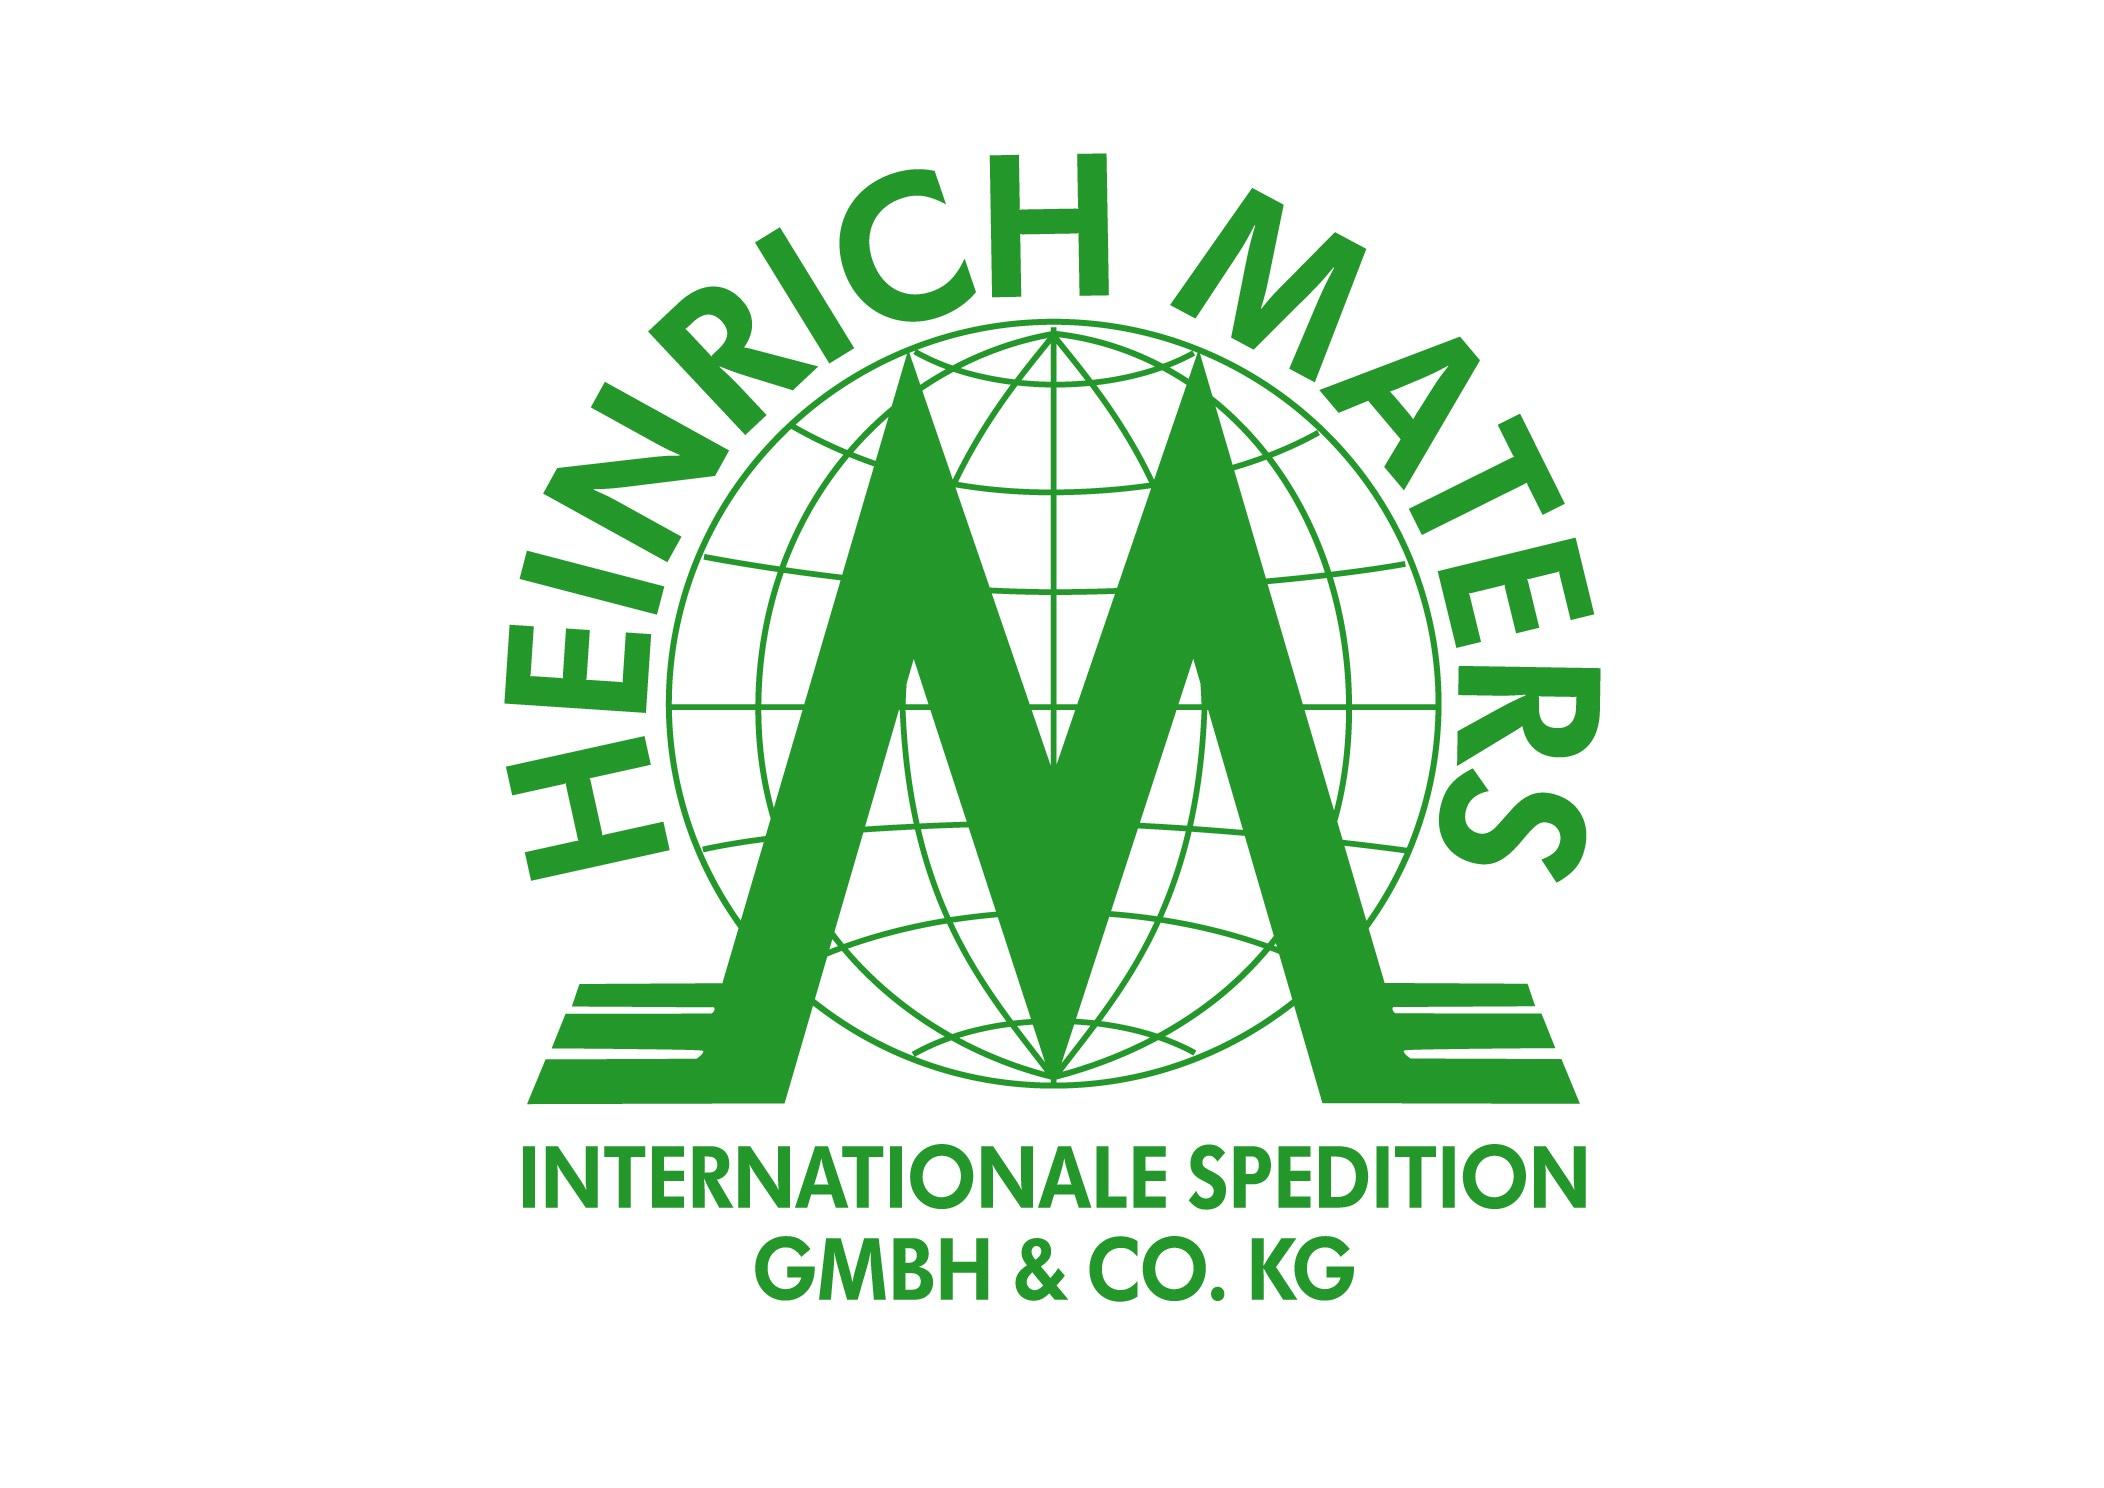 Heinrich Maters GmbH & Co. KG